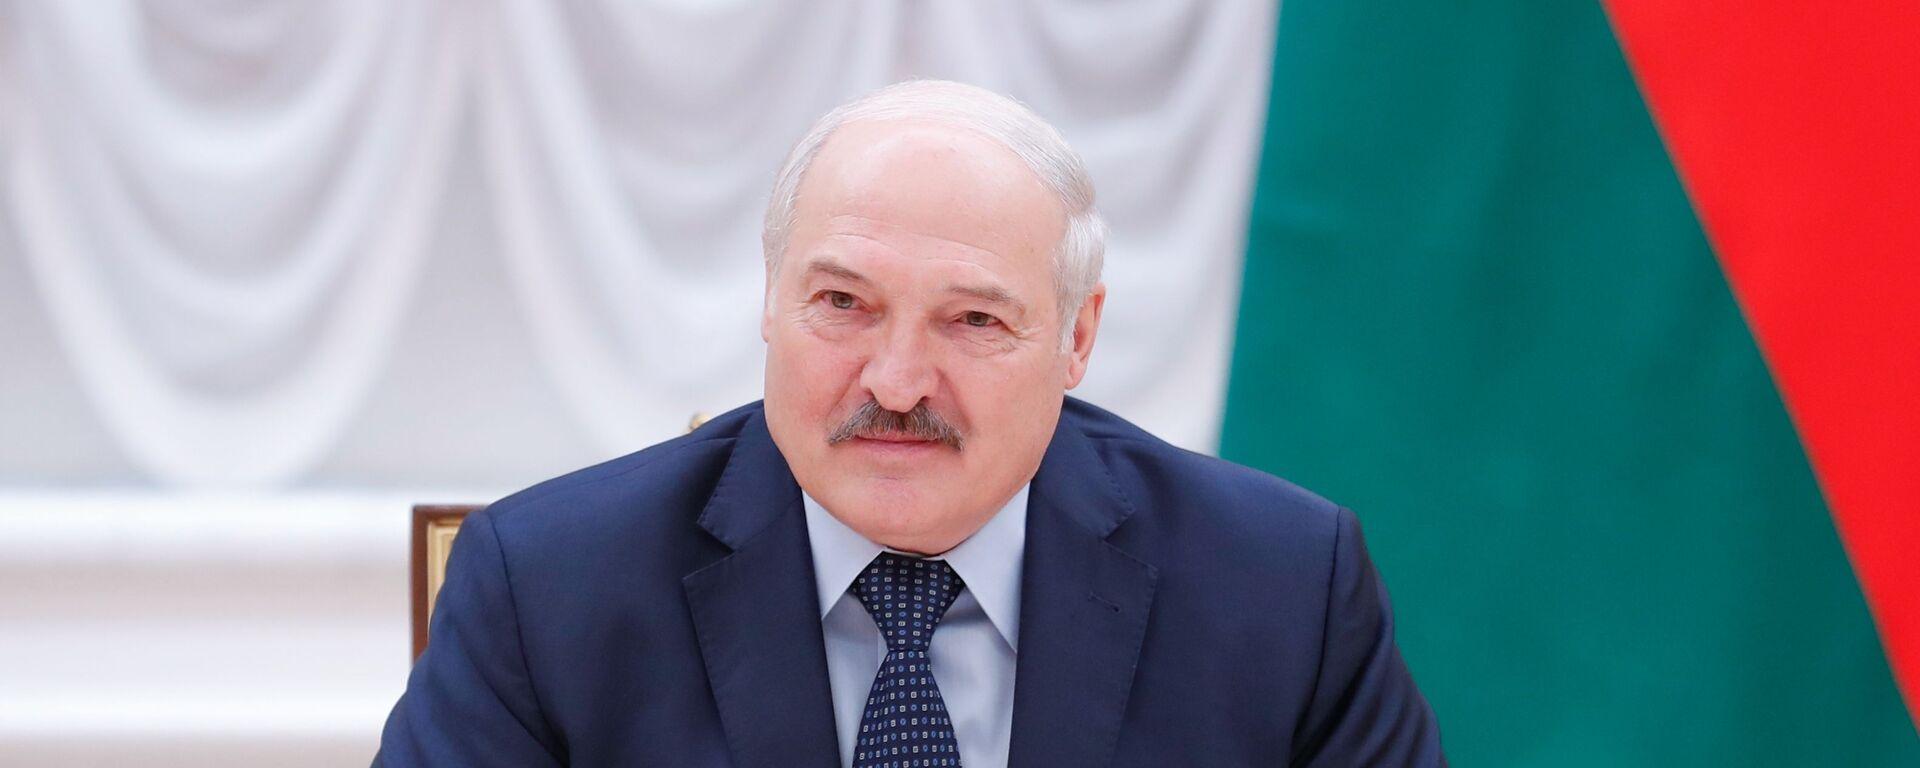 Baltkrievijas prezidents Aleksandrs Lukašenko - Sputnik Latvija, 1920, 22.07.2021